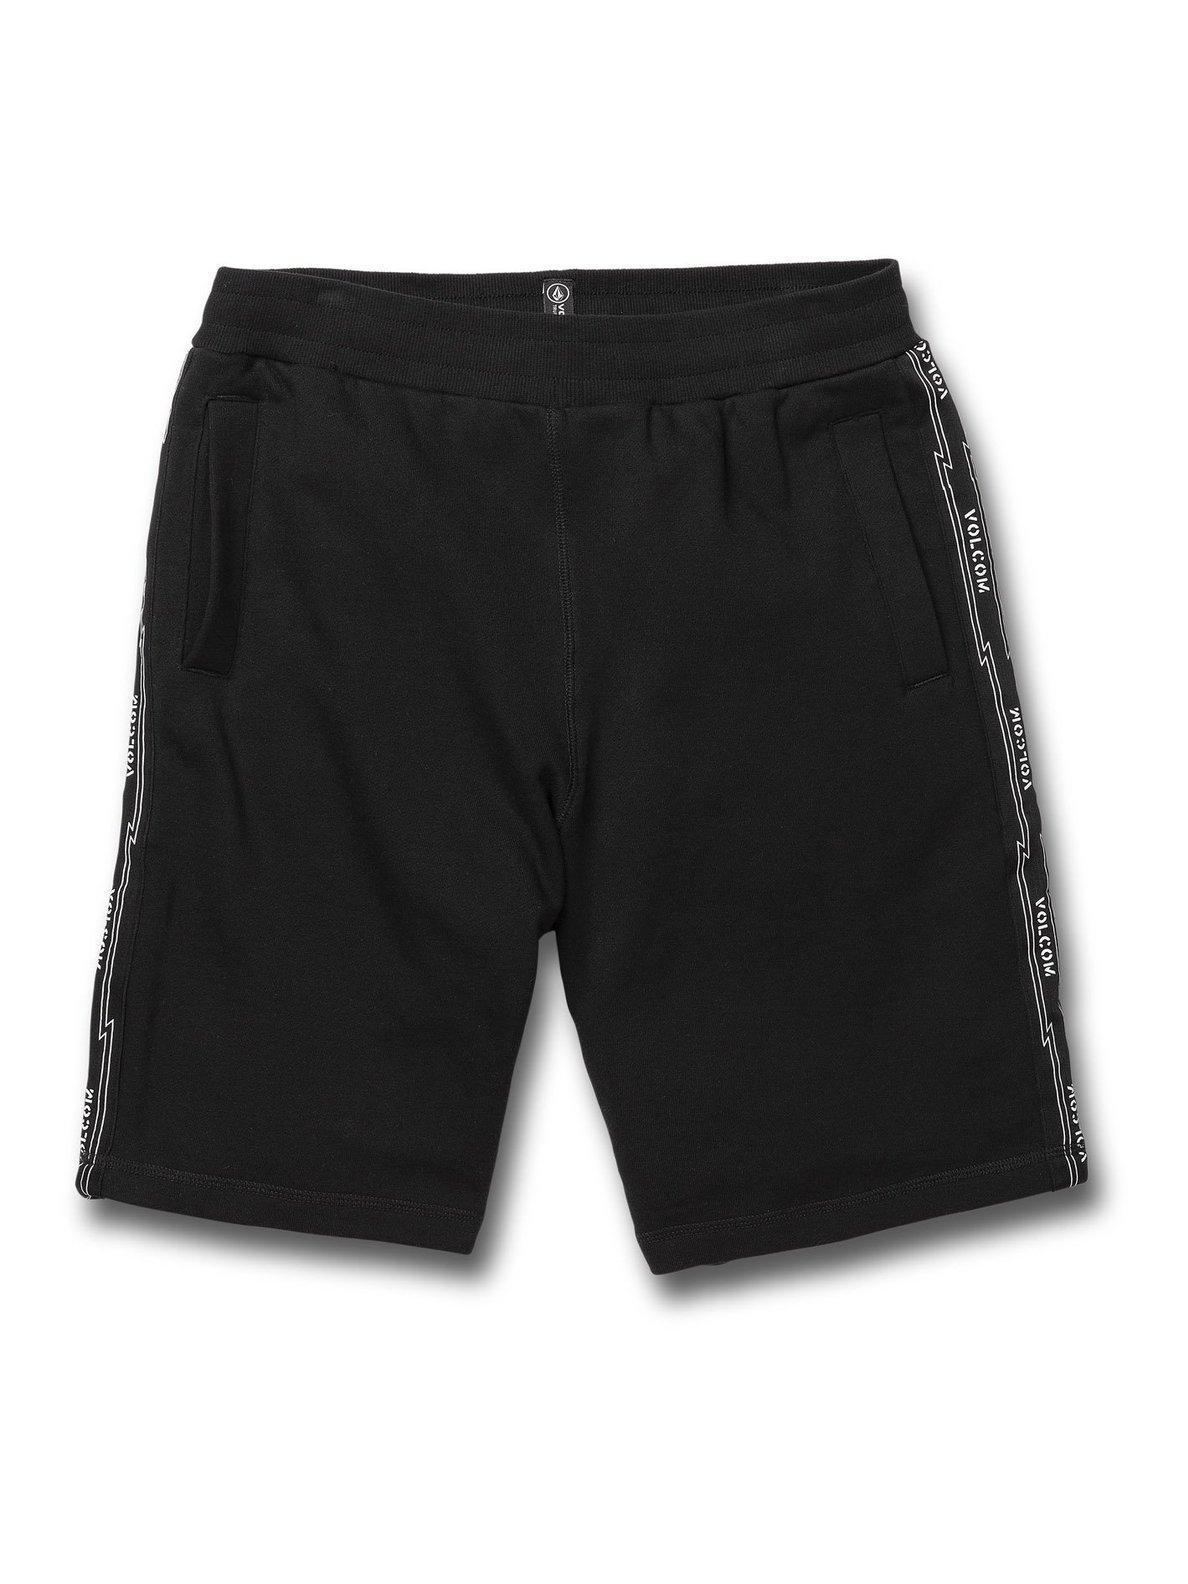 Pantaloncini Volcom Veeline Short